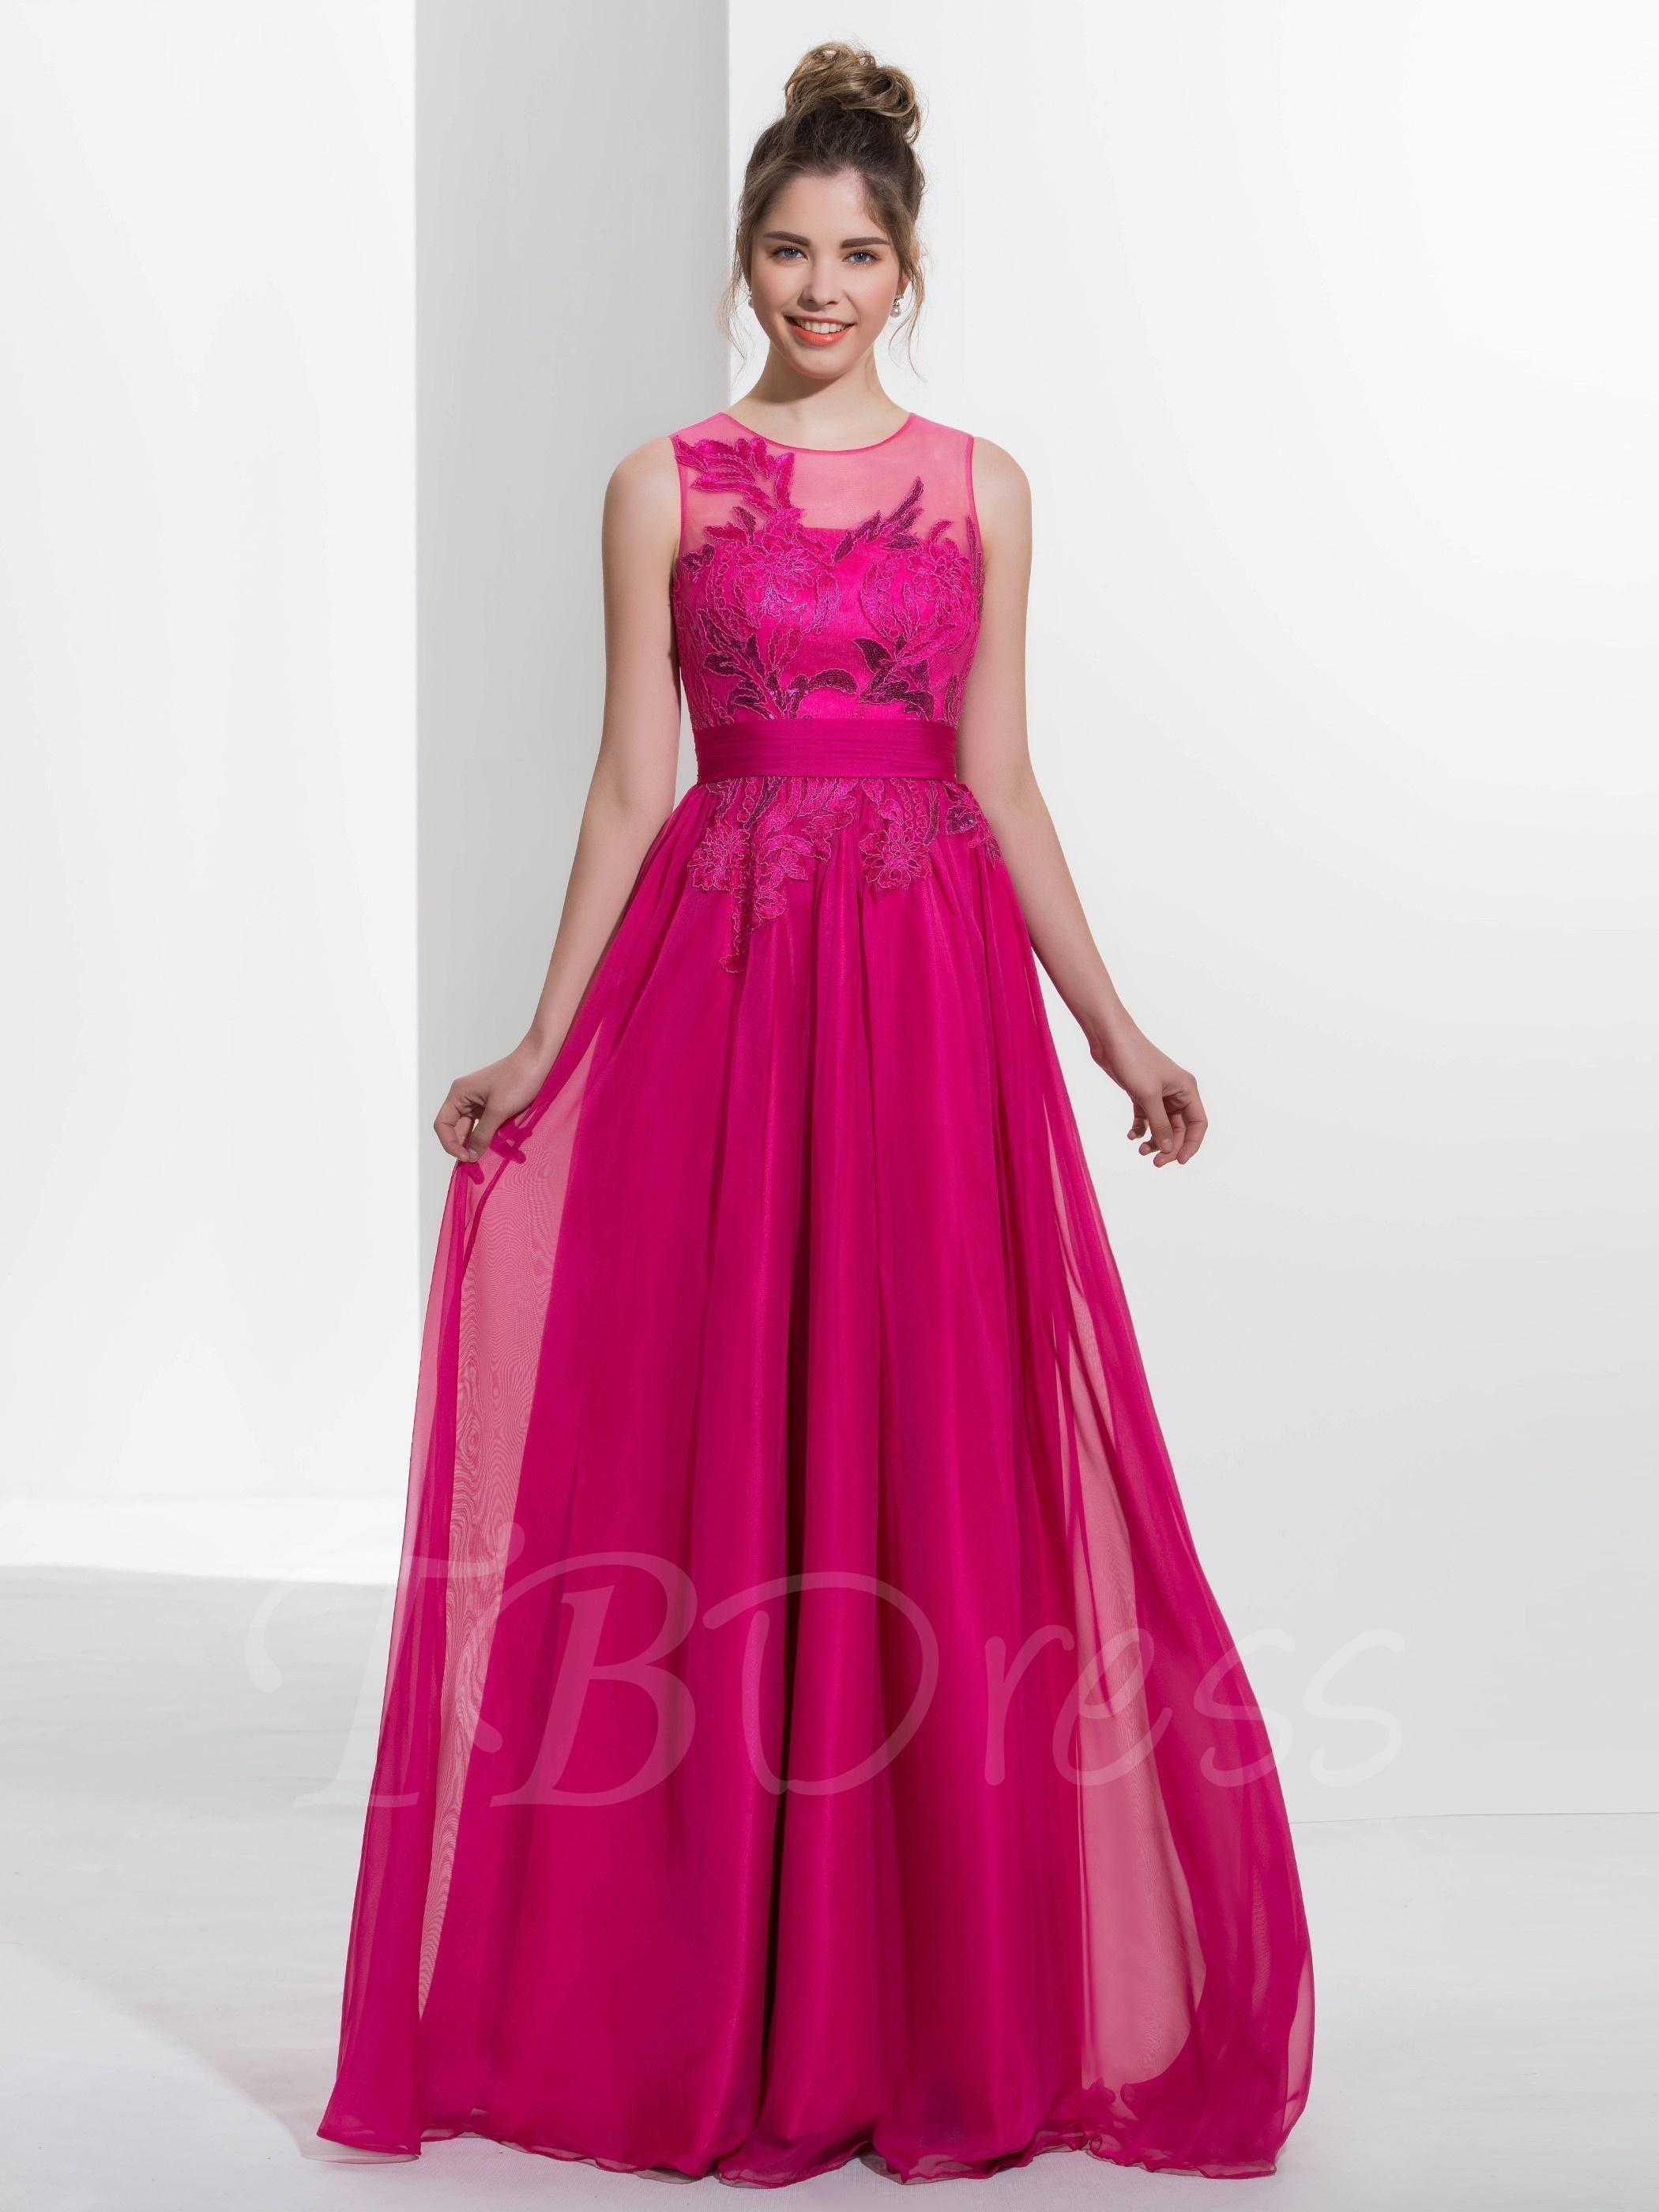 TBDress - TBDress A-Line Jewel Appliques Sequins Sweep Train Prom ...